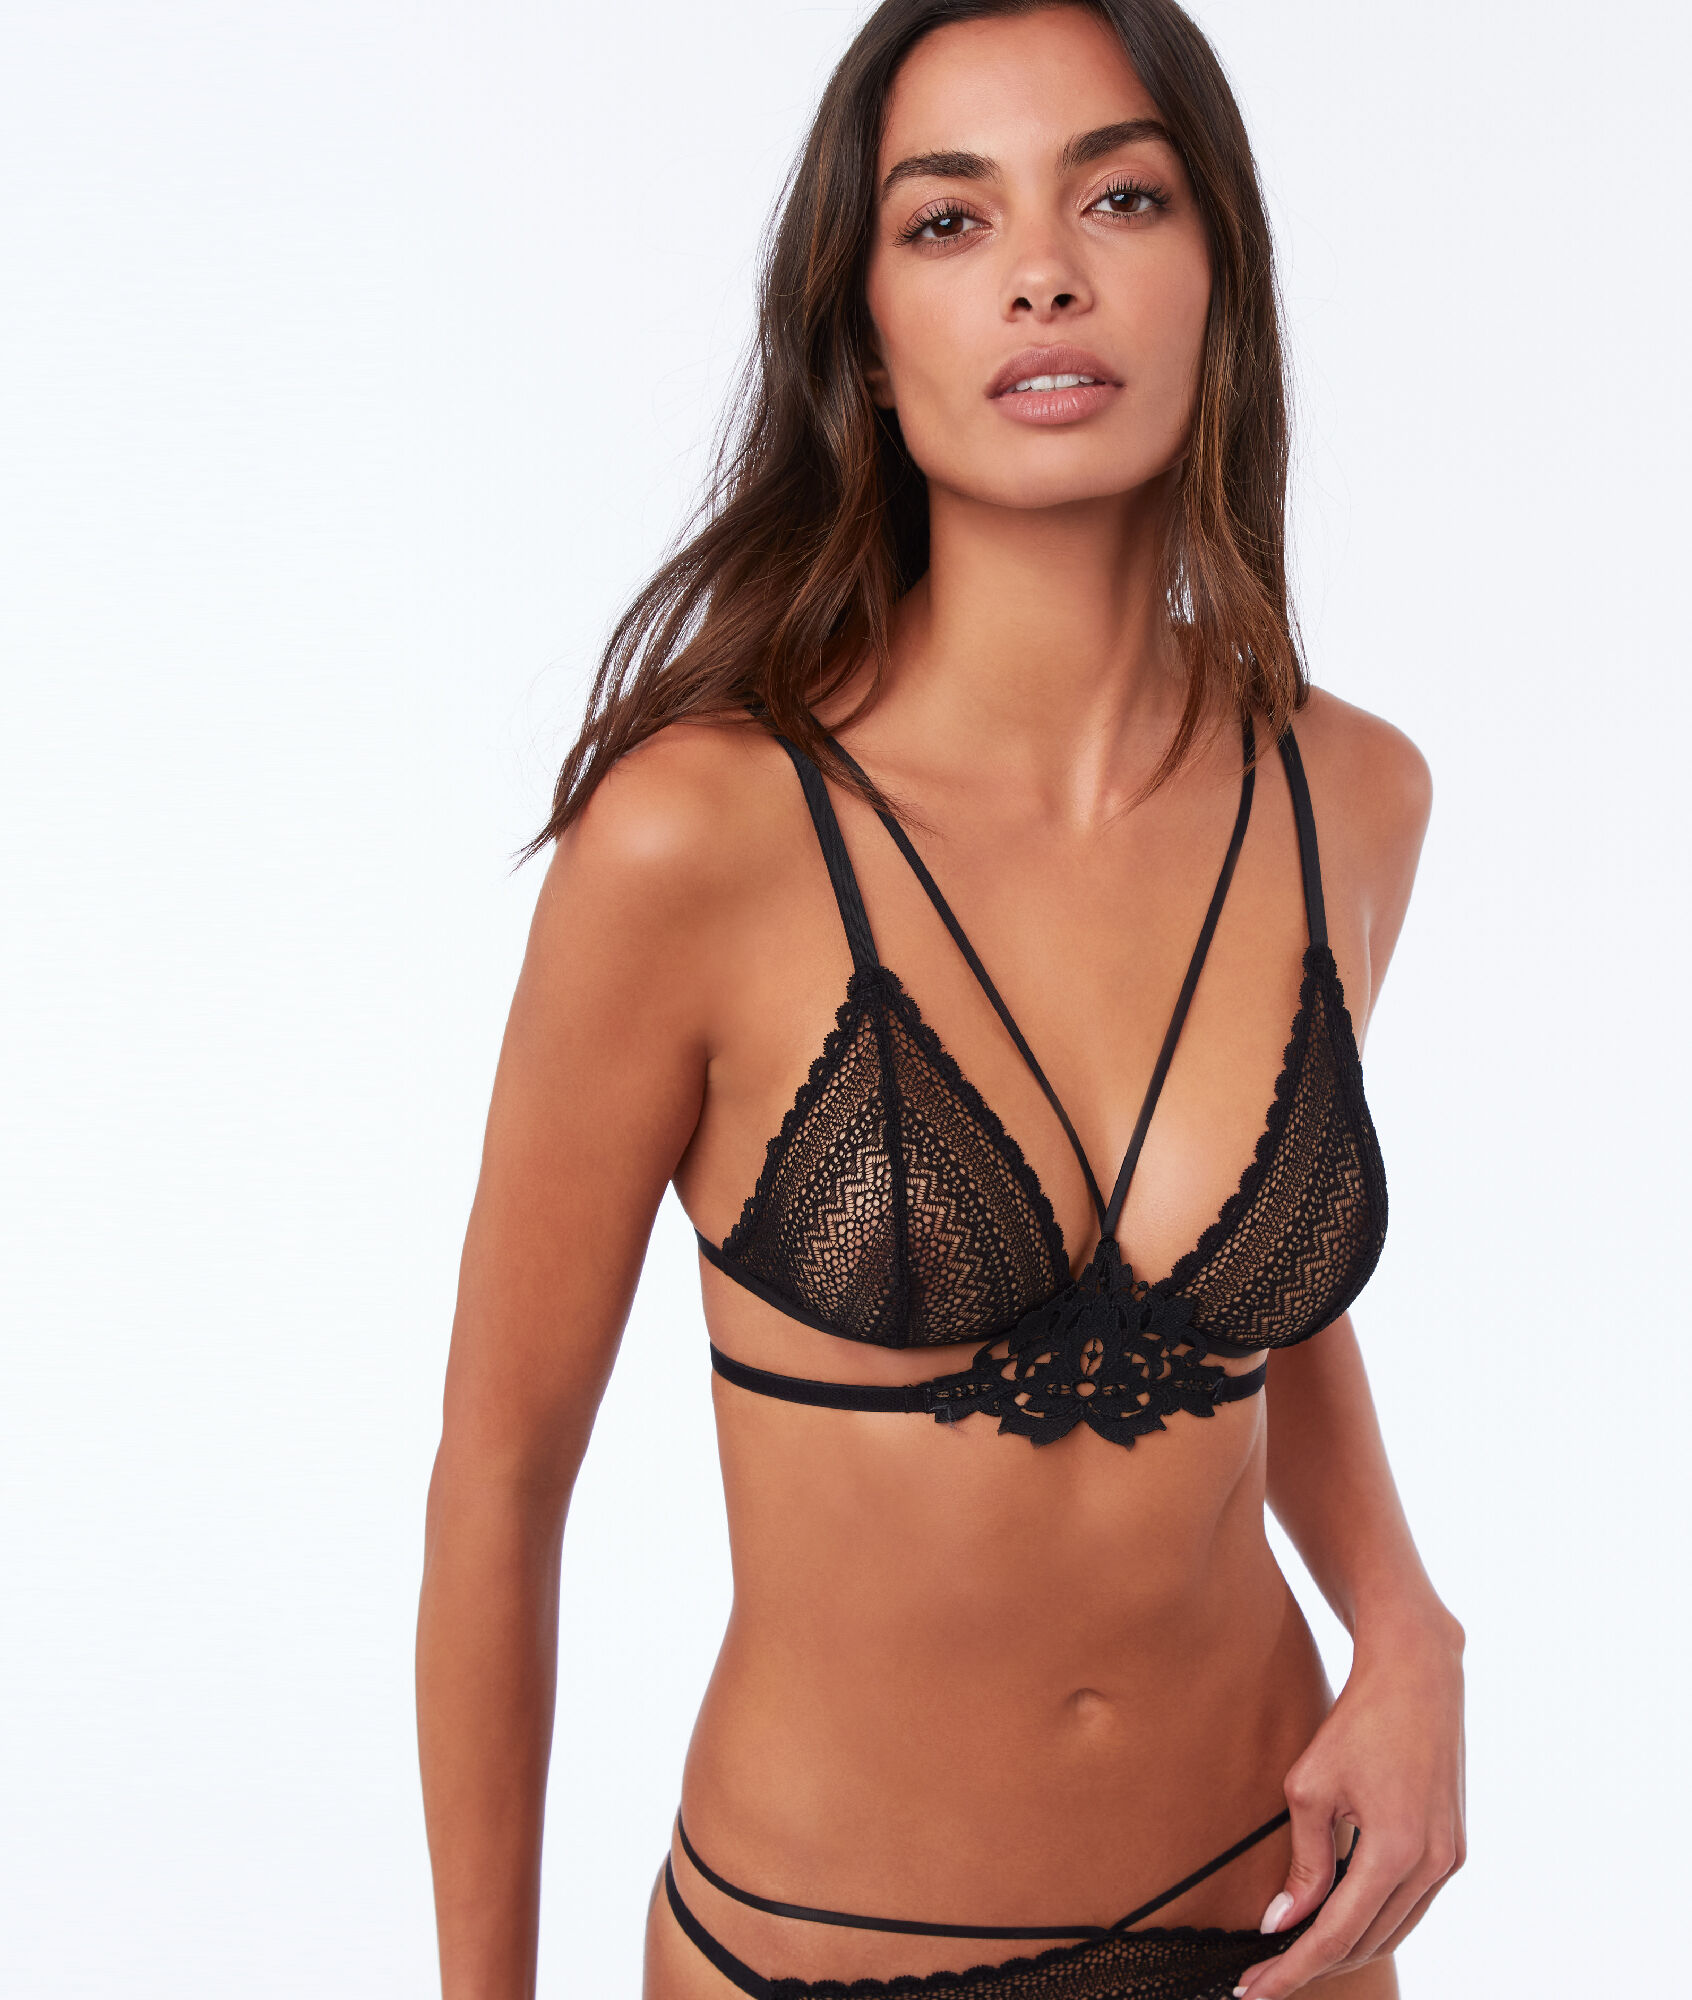 a605c3e5372f0 Lace triangle bra with laces - CROONER - Black - Etam